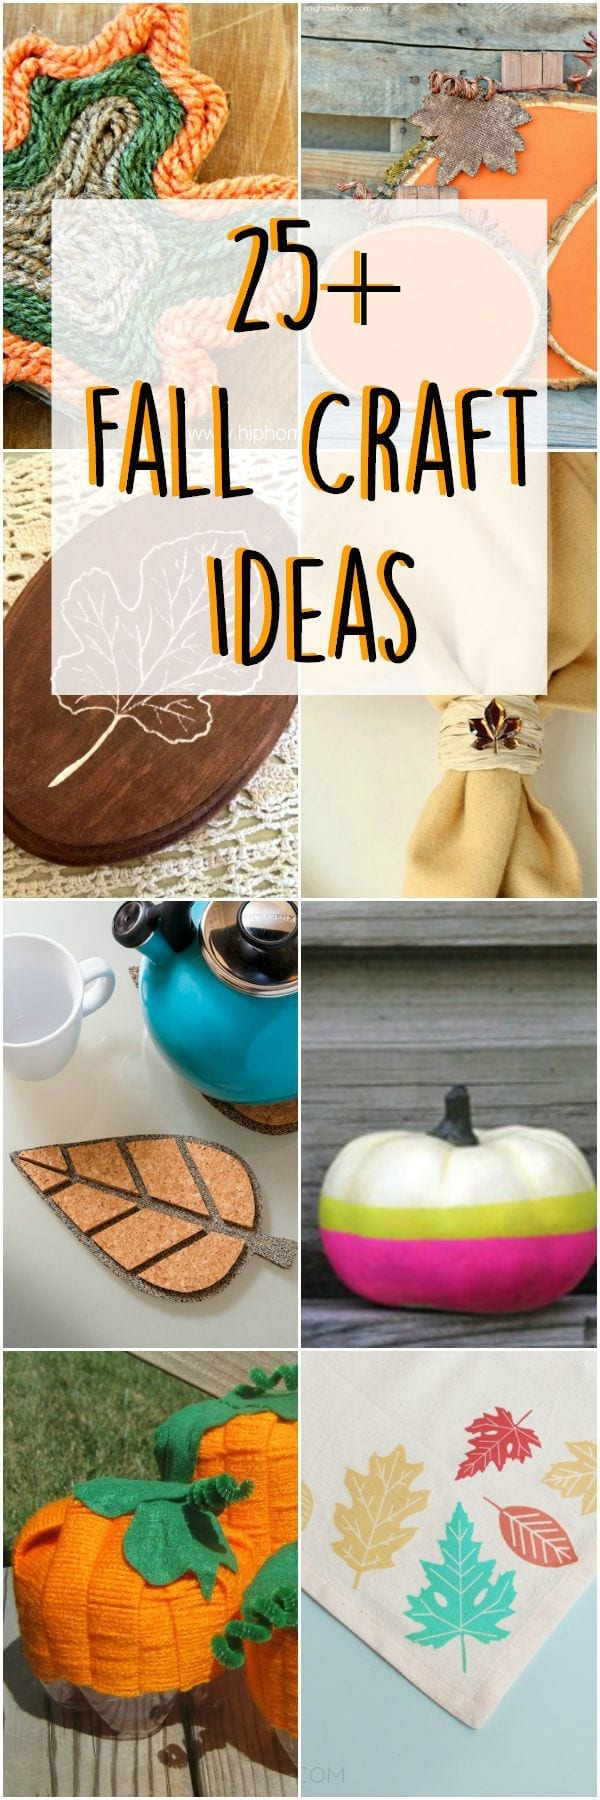 25+ Fall craft ideas